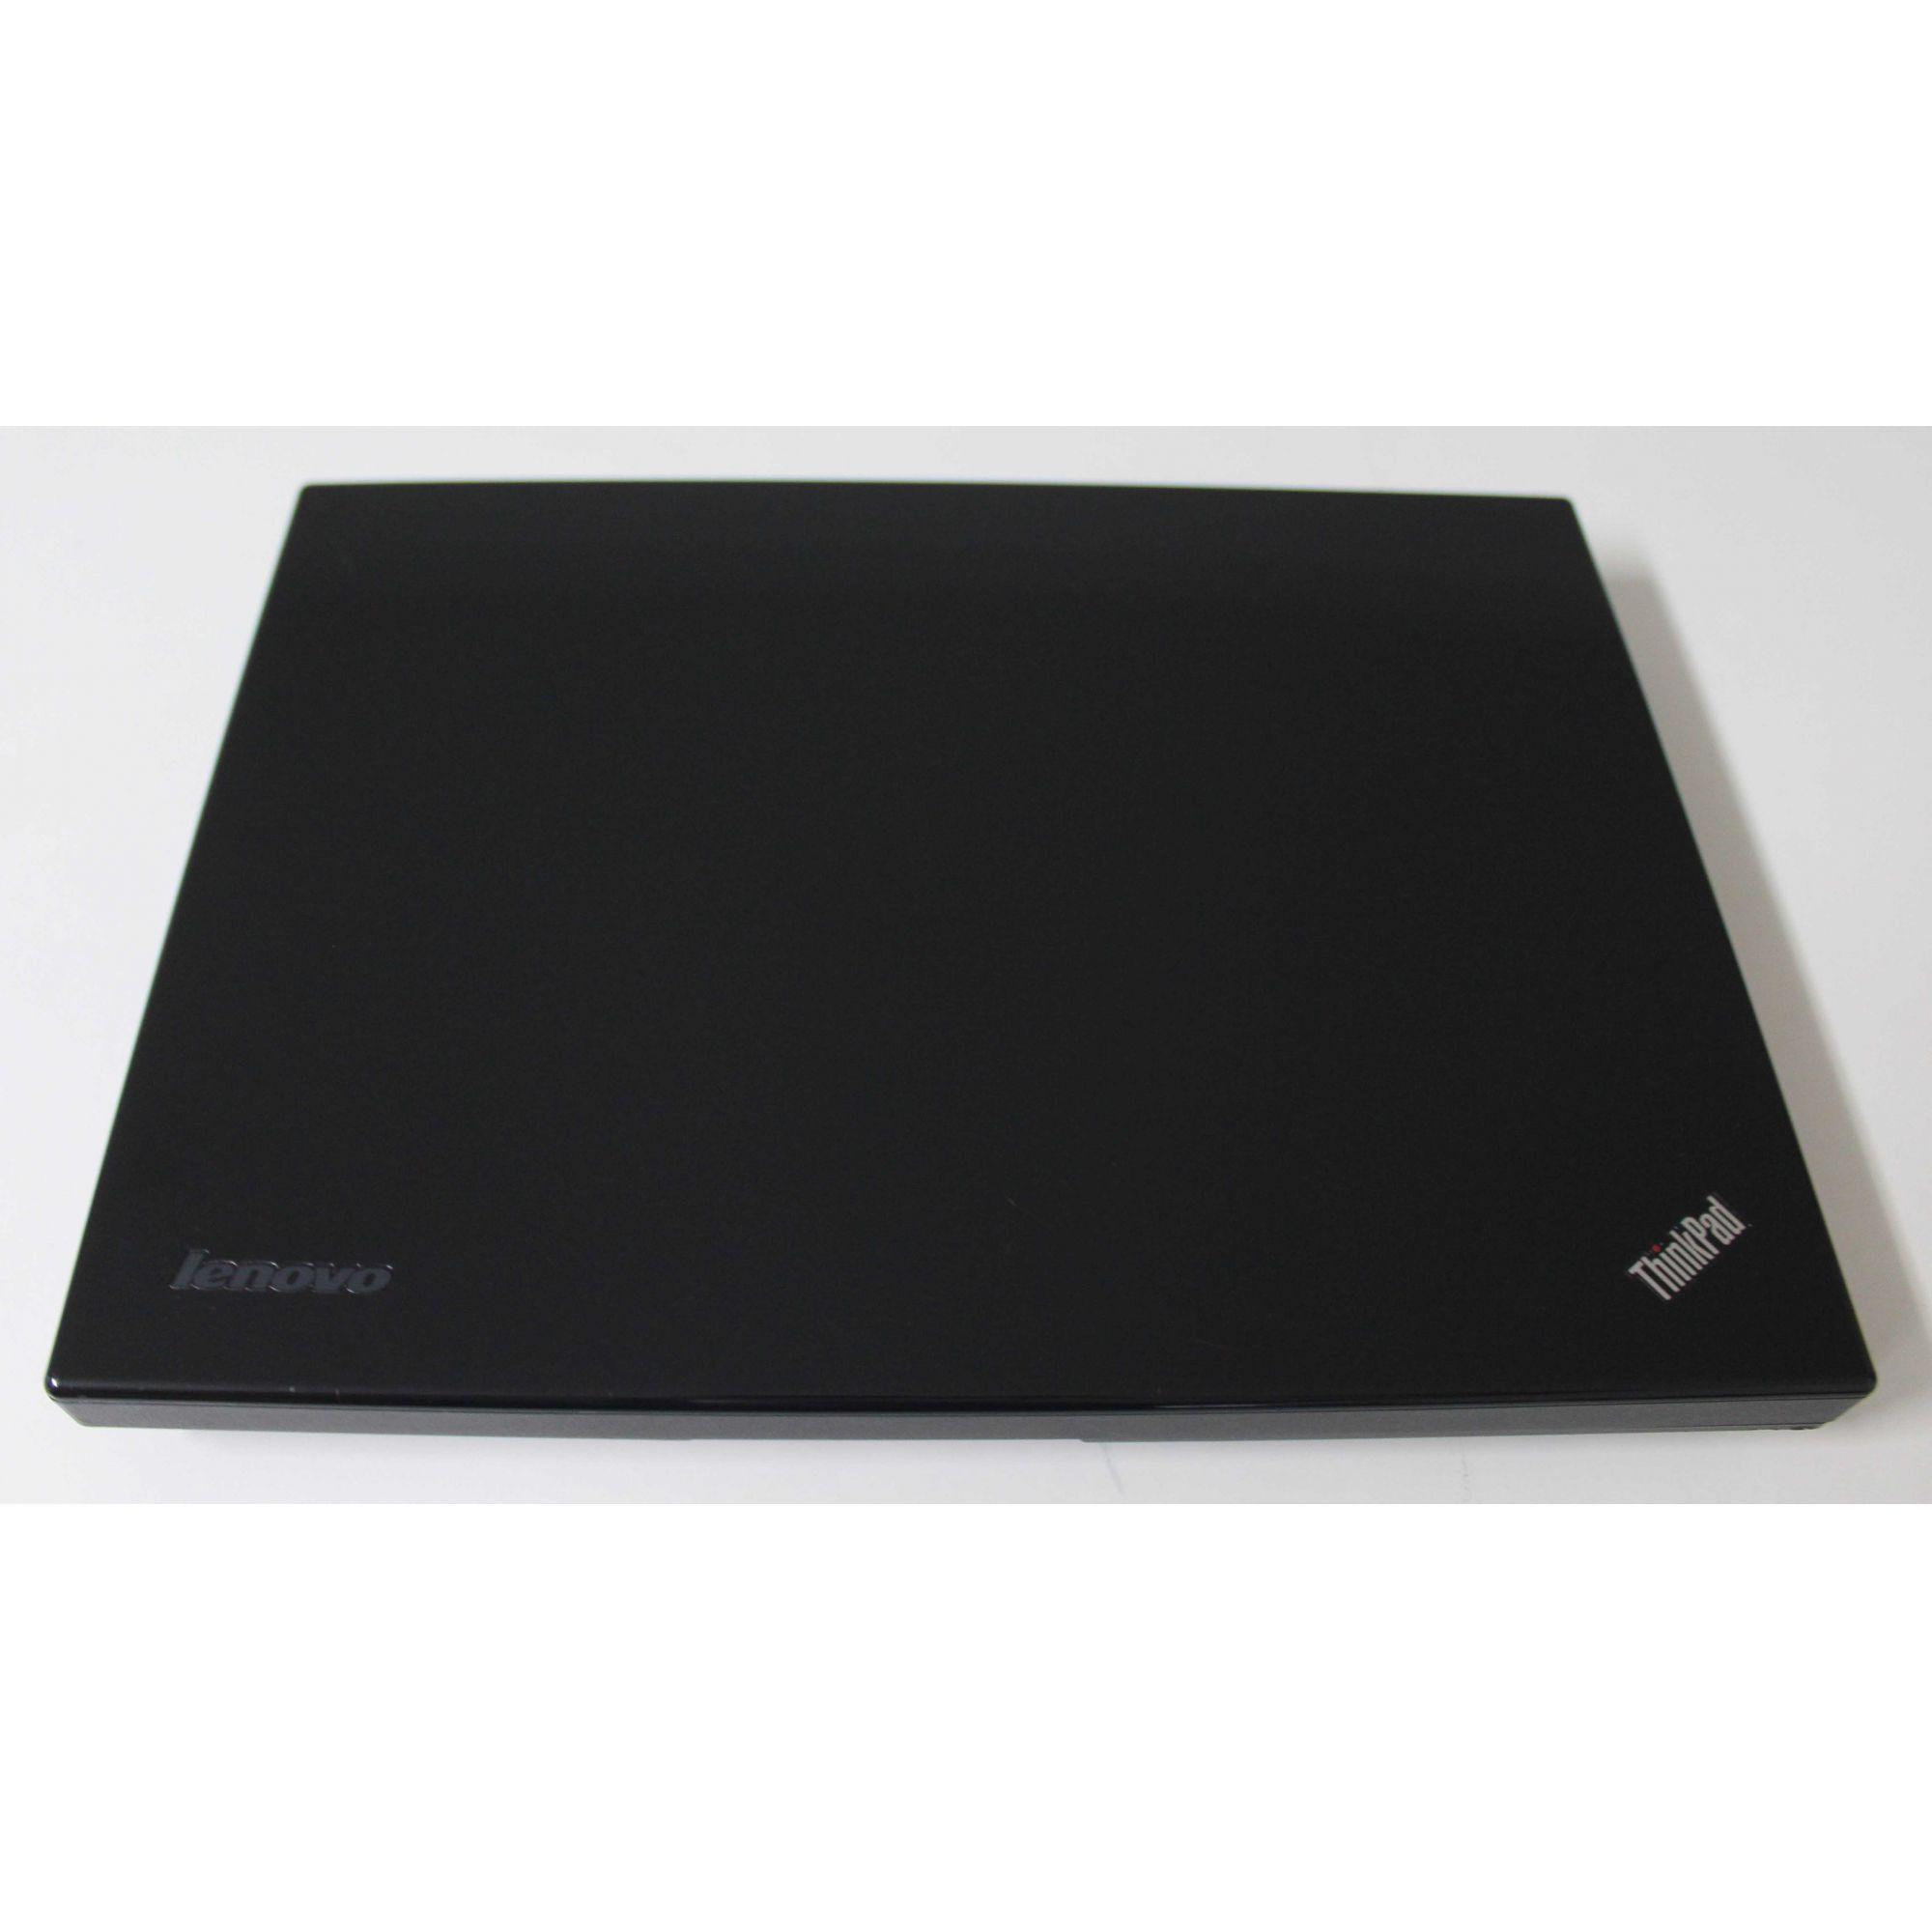 "Notebook Lenovo Thinkpad SL400 14.1"" Intel Core 2 Duo 2.26GHz 2GB HD-160GB"